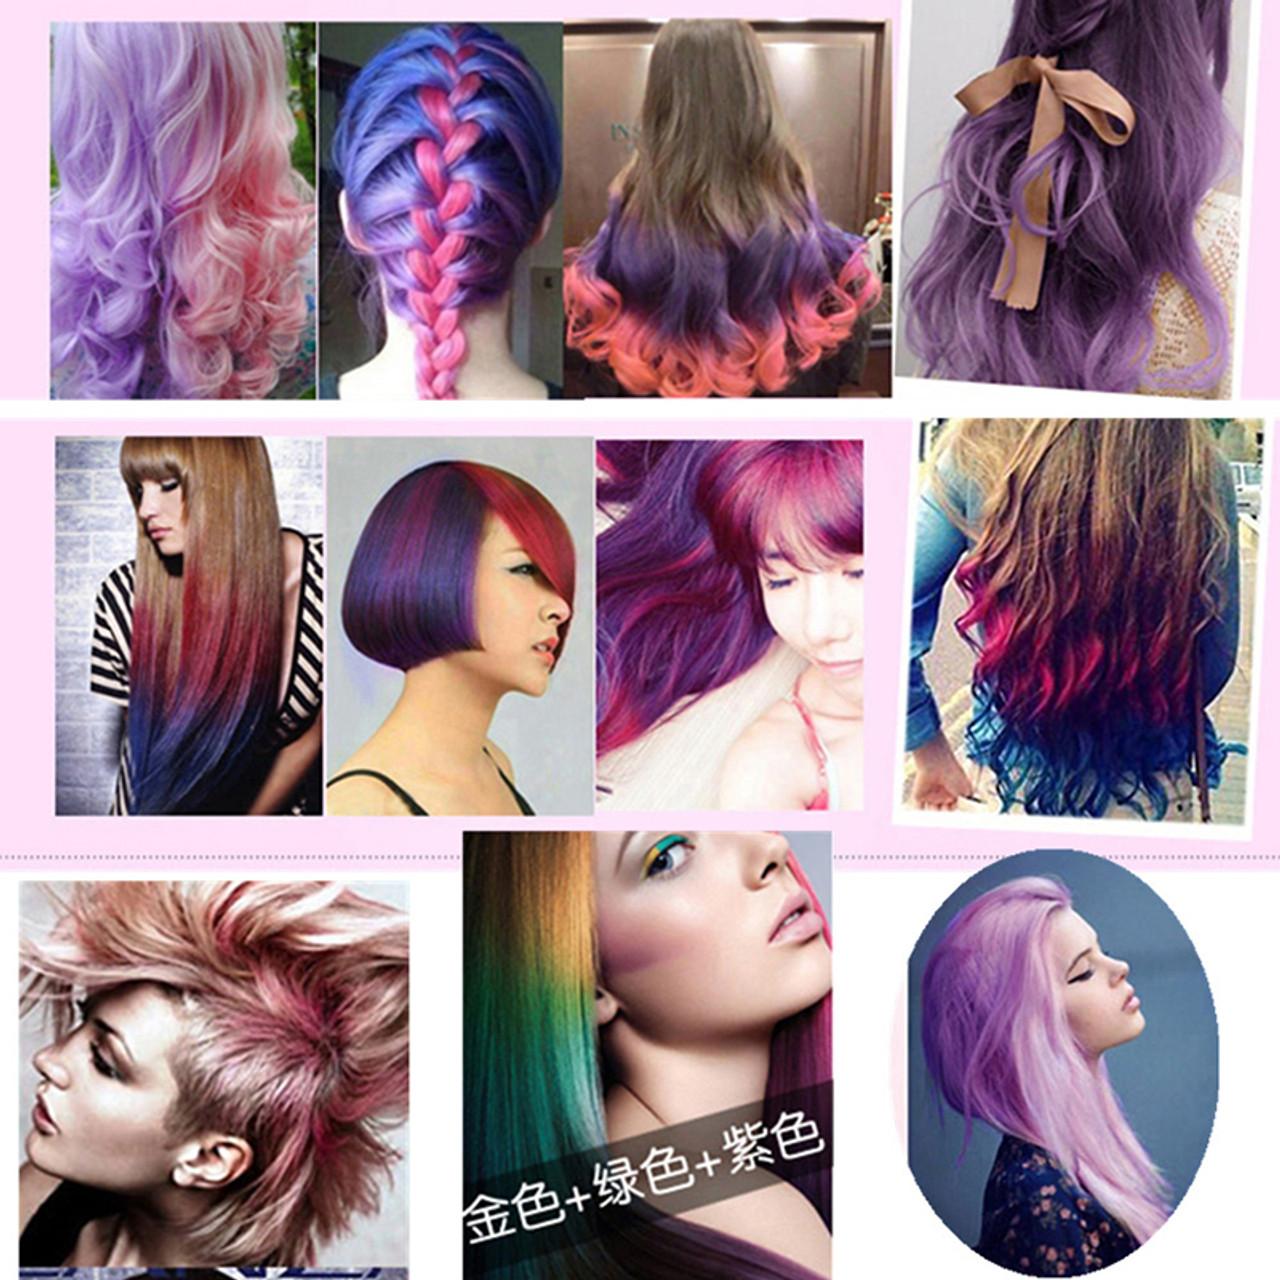 One Time Temporary Color Hair Dye Pomade Hair Wax Natural Hair Style